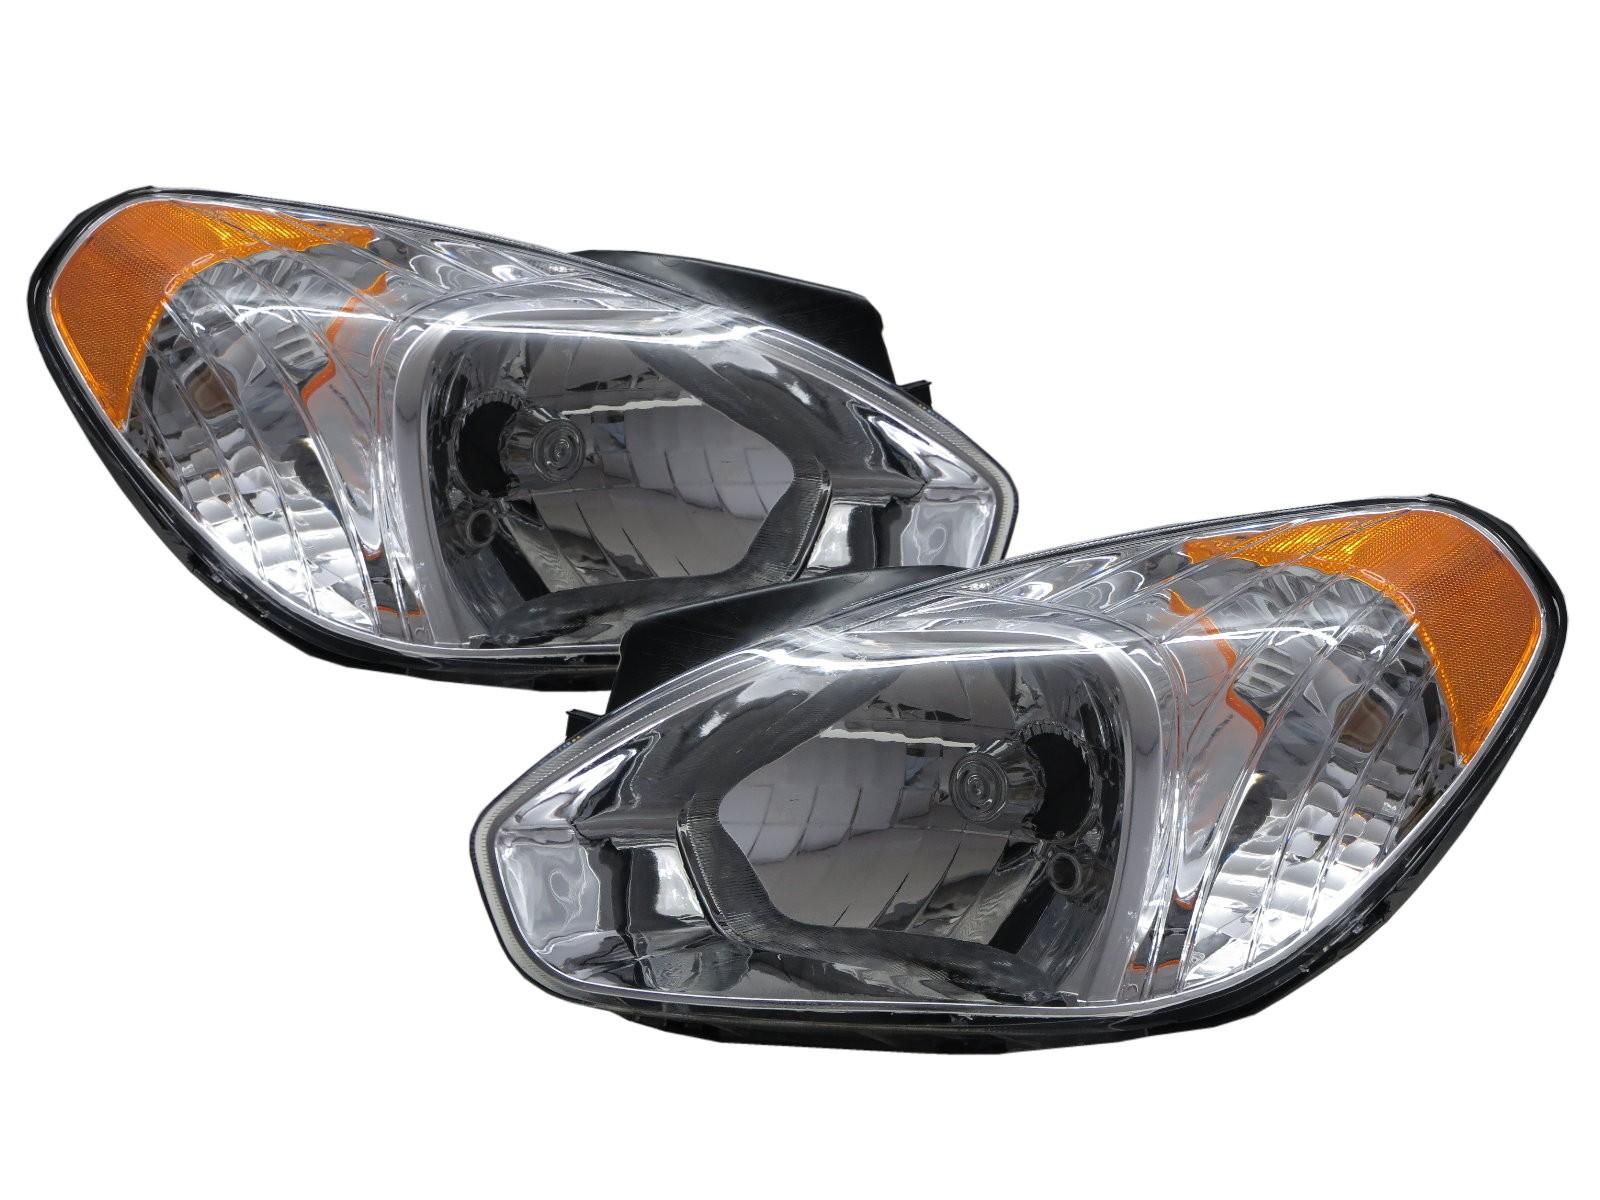 CrazyTheGod Attitude MC First generation 2005-2011 Sedan 4D Clear Headlight Headlamp Chrome V2 for DODGE LHD